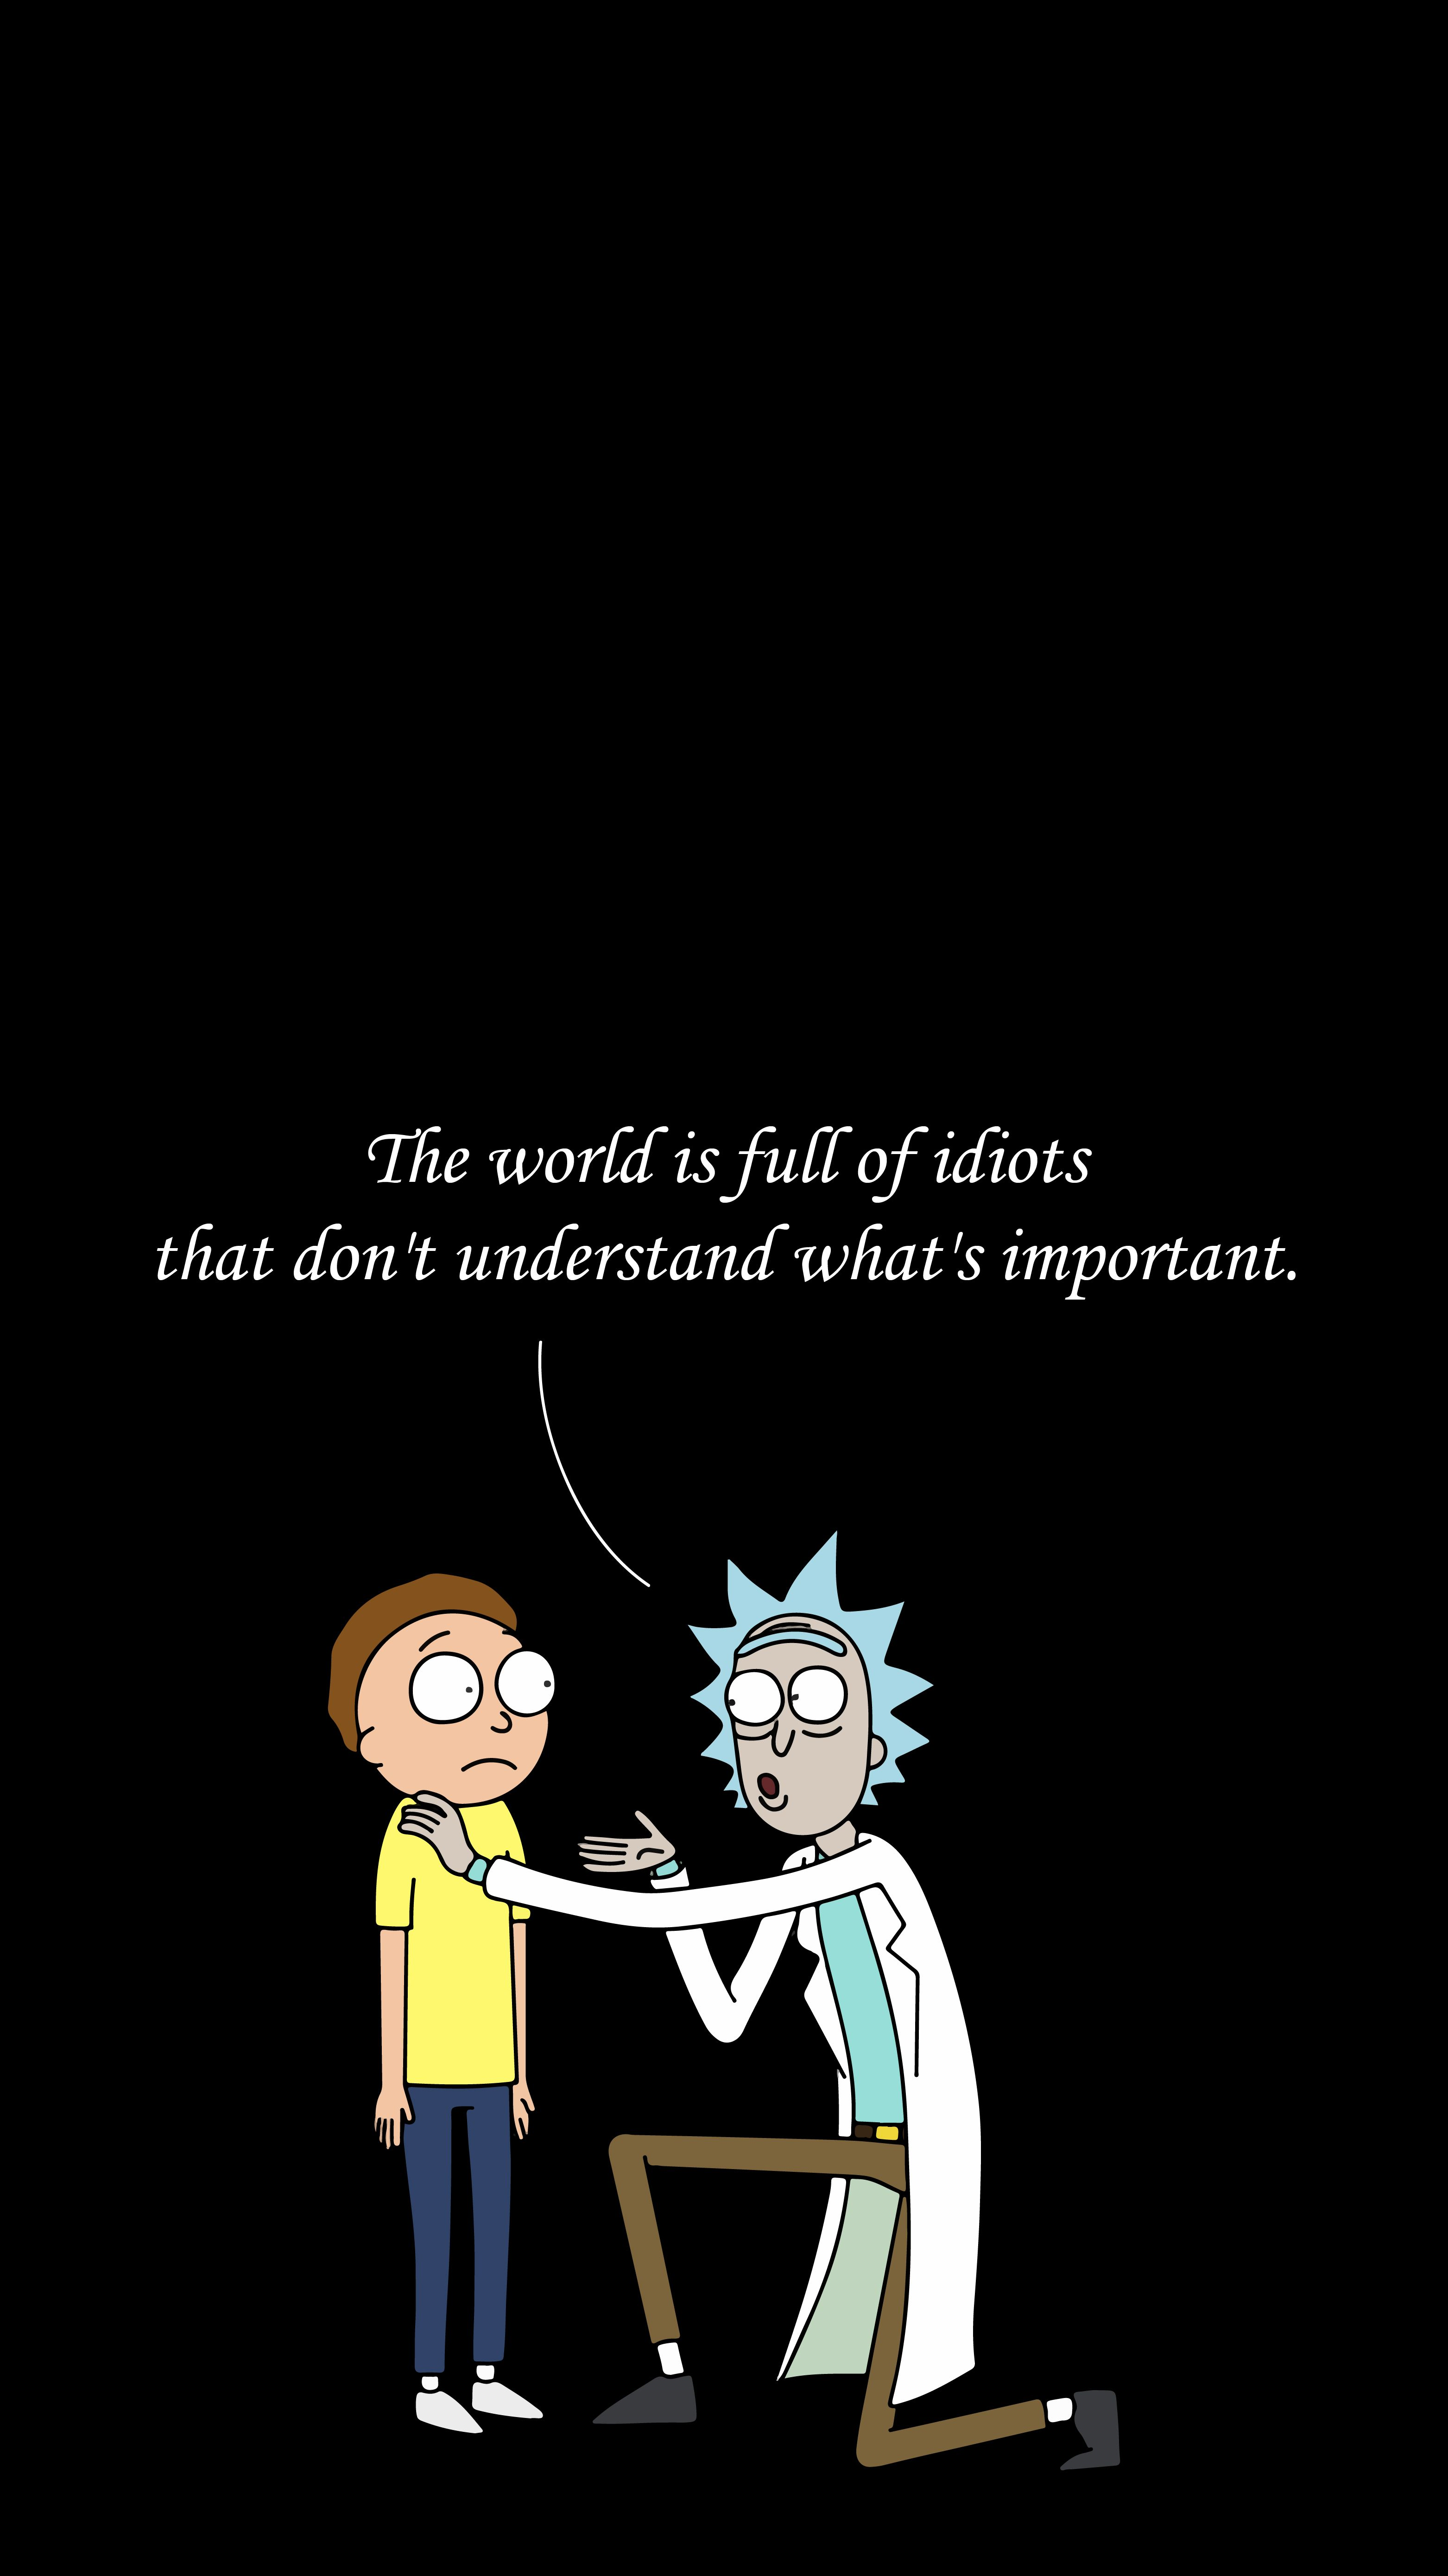 U8mlqah39hex Jpg 3125 5558 Rick And Morty Poster Rick And Morty Quotes Rick And Morty Drawing